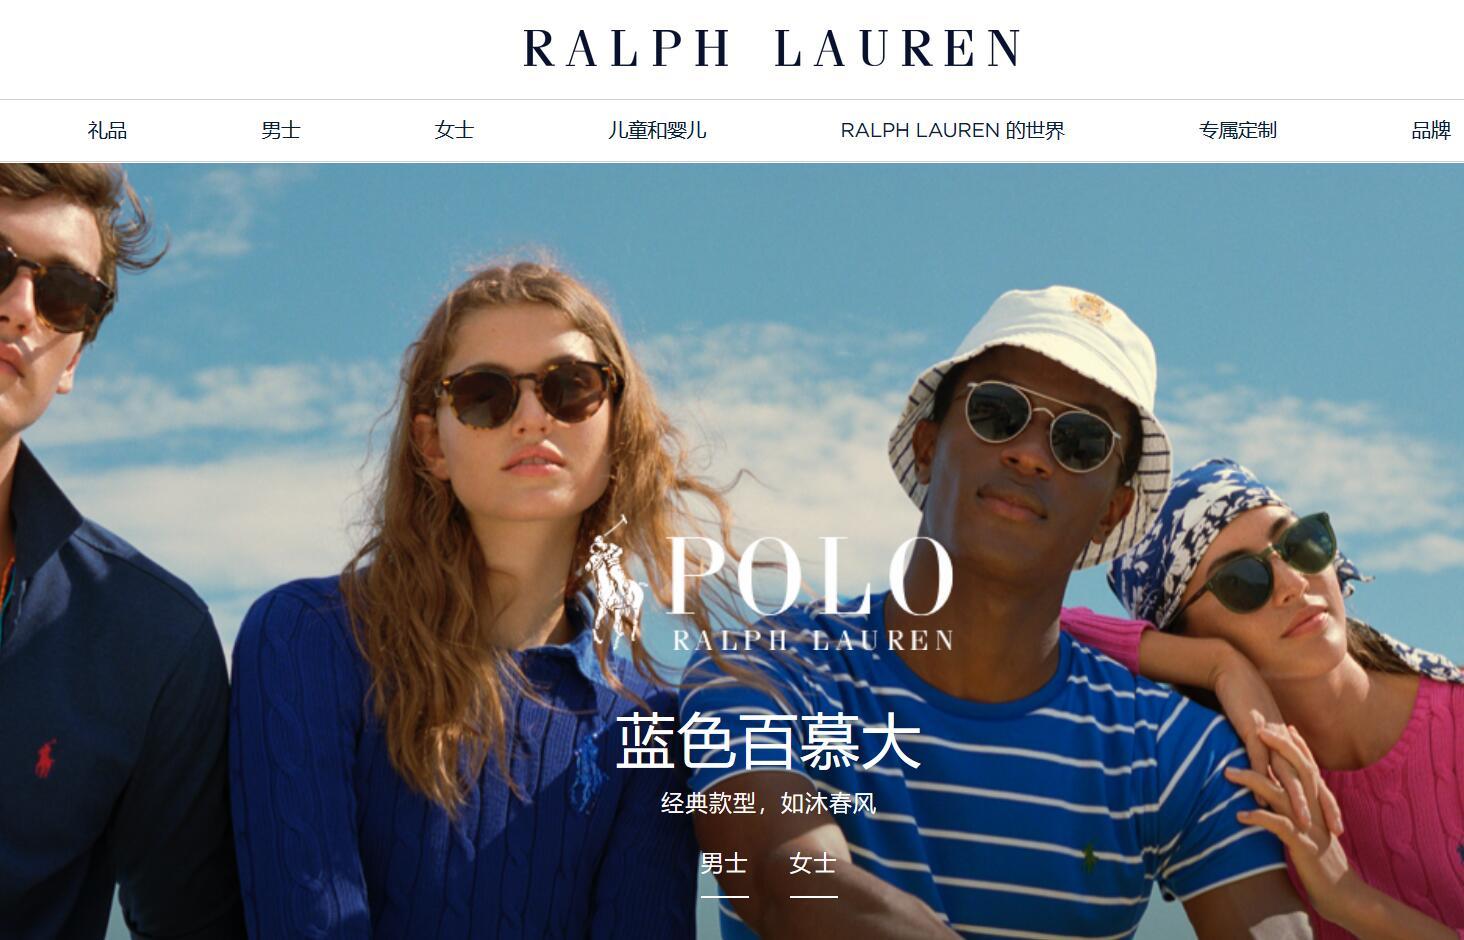 Ralph Lauren中国大陆门店已暂时关闭三分之二,疫情的负面影响或高达7000万美元